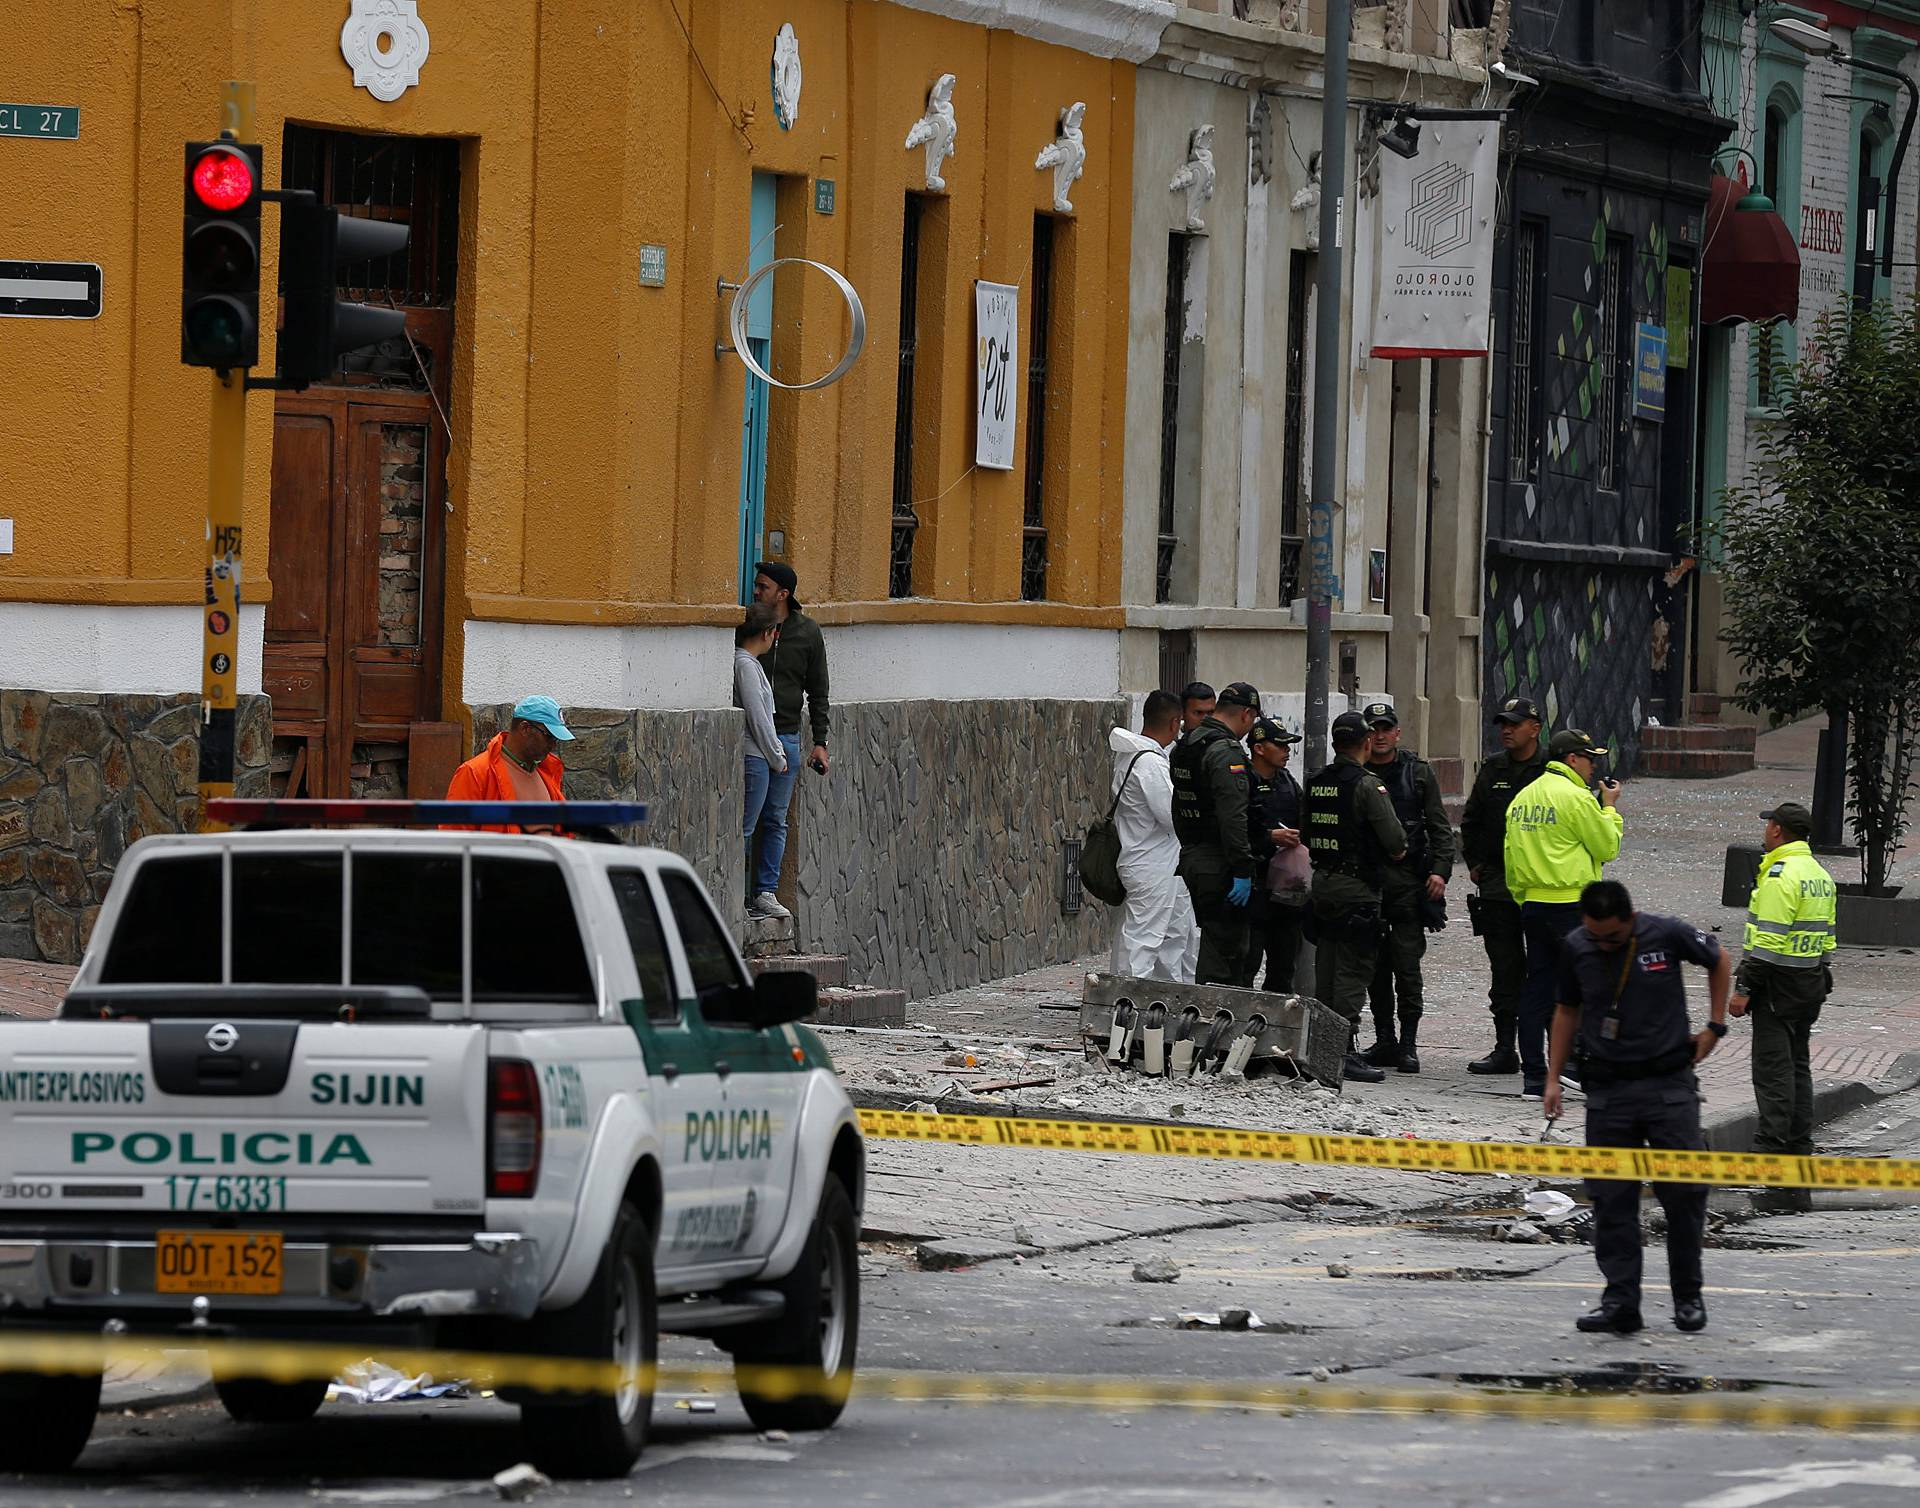 Police work the scene where an explosion occurred near Bogota's bullring